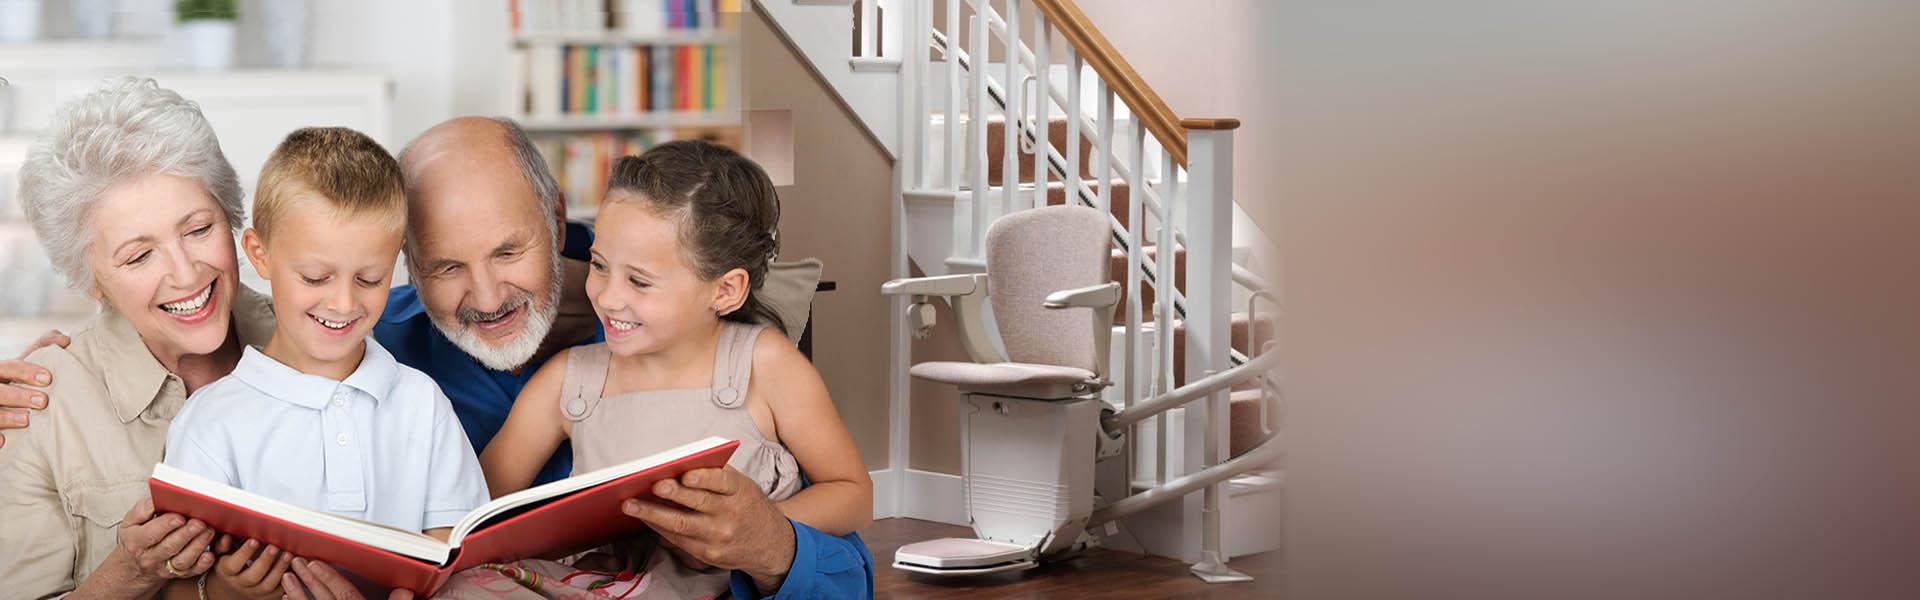 stair chair for seniors